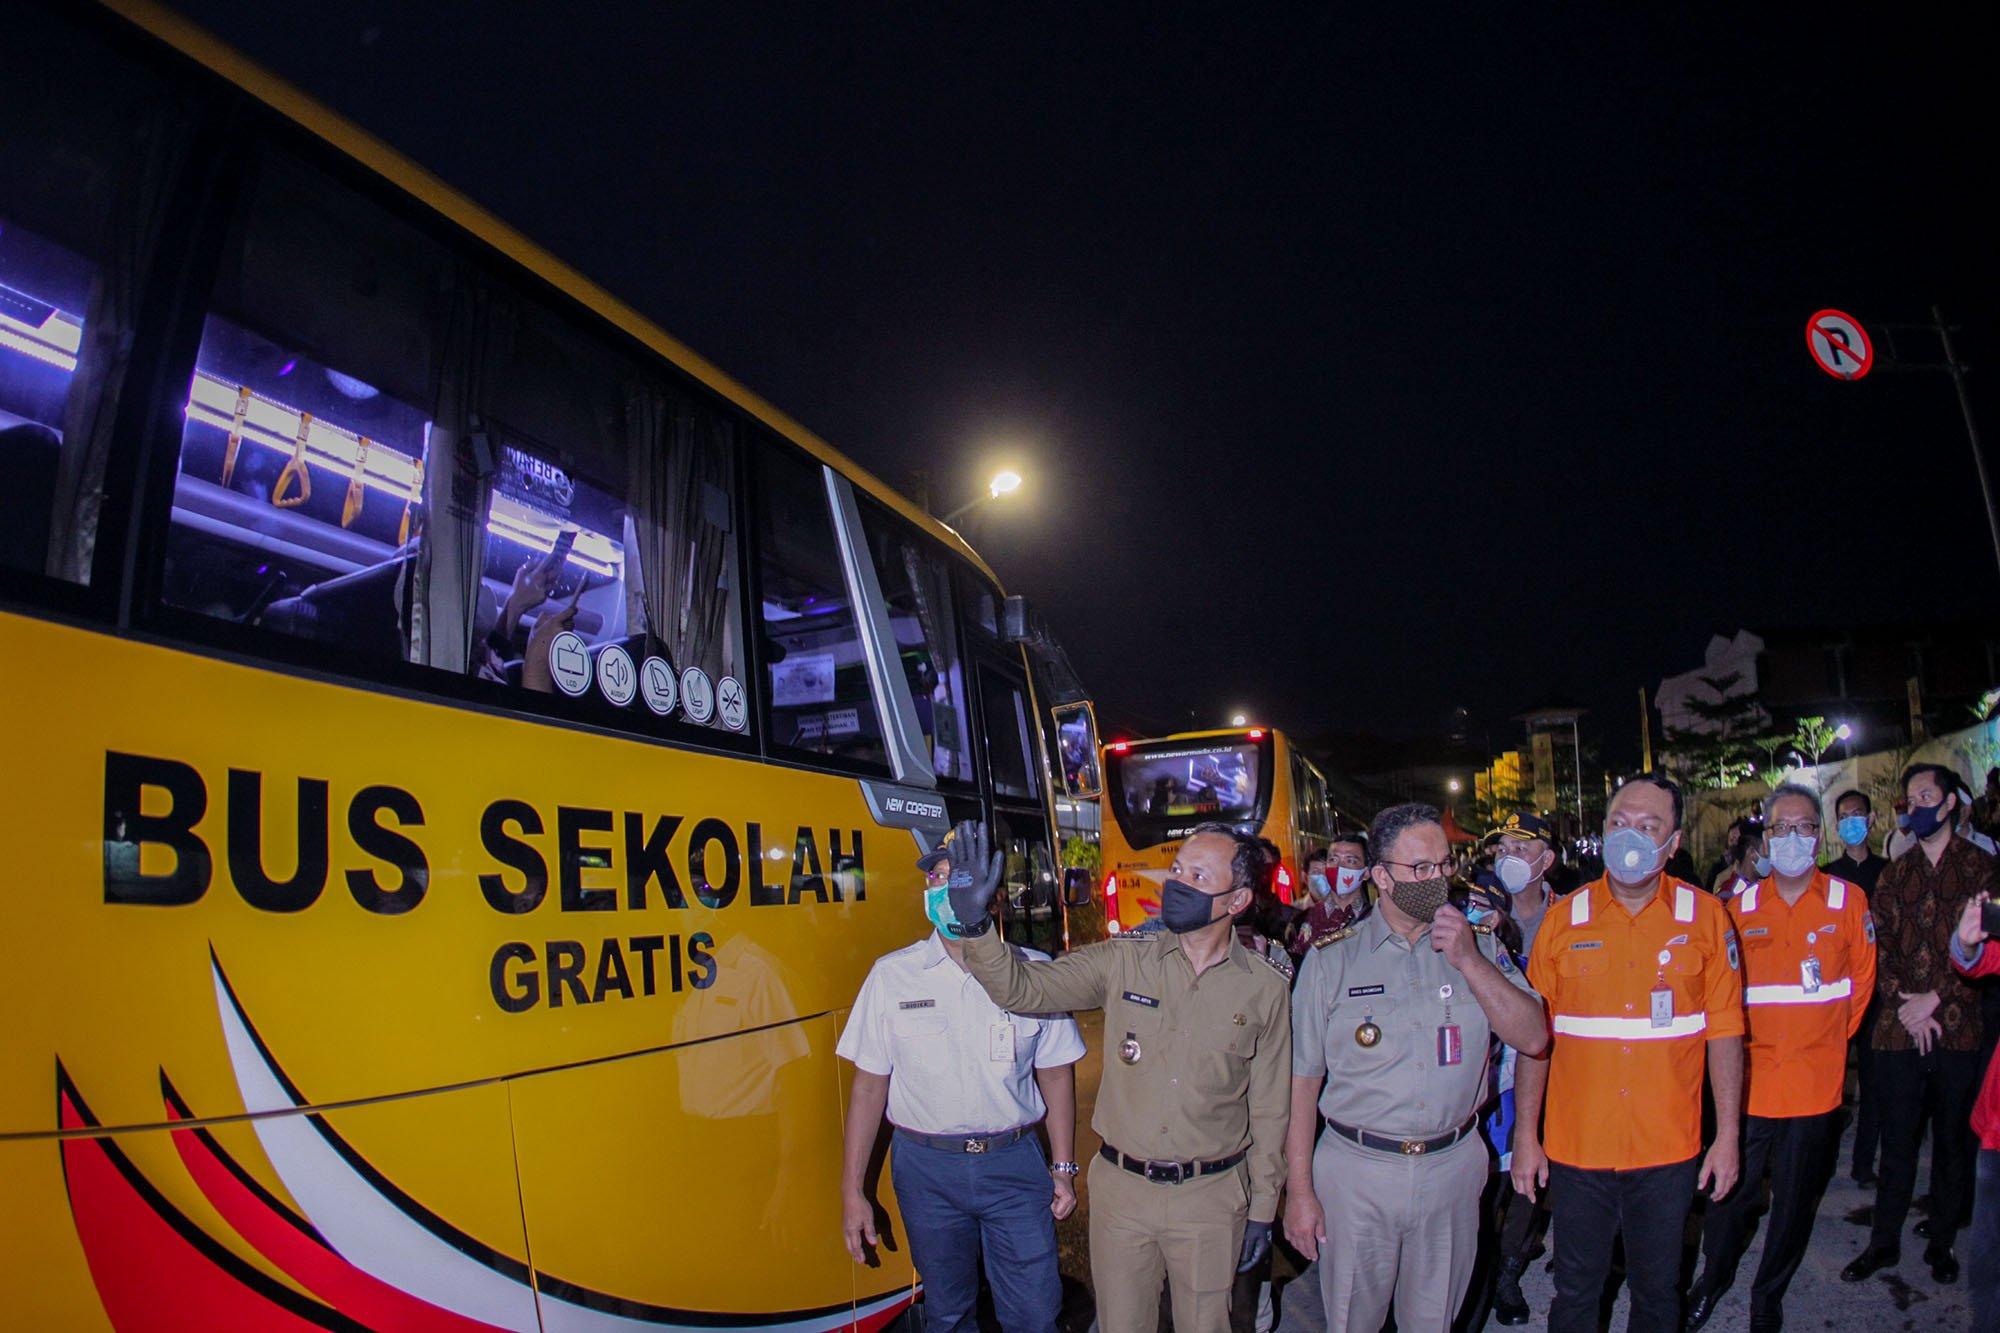 Anies Baswedan dan Bima Arya Tinjau Arus Penumpang Stasiun Bogor 233